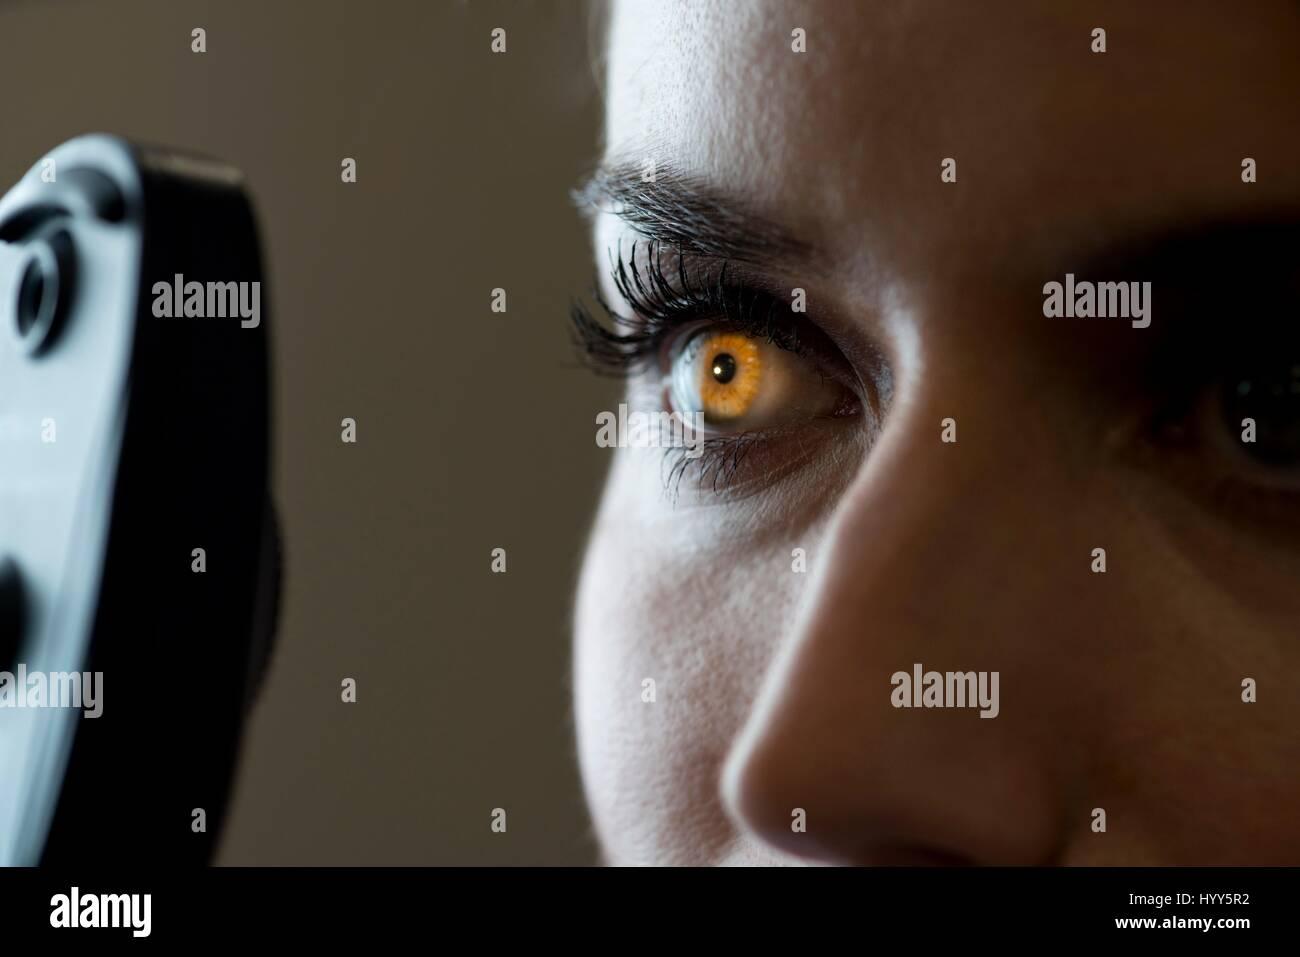 Woman having eye test with light shining in iris. - Stock Image